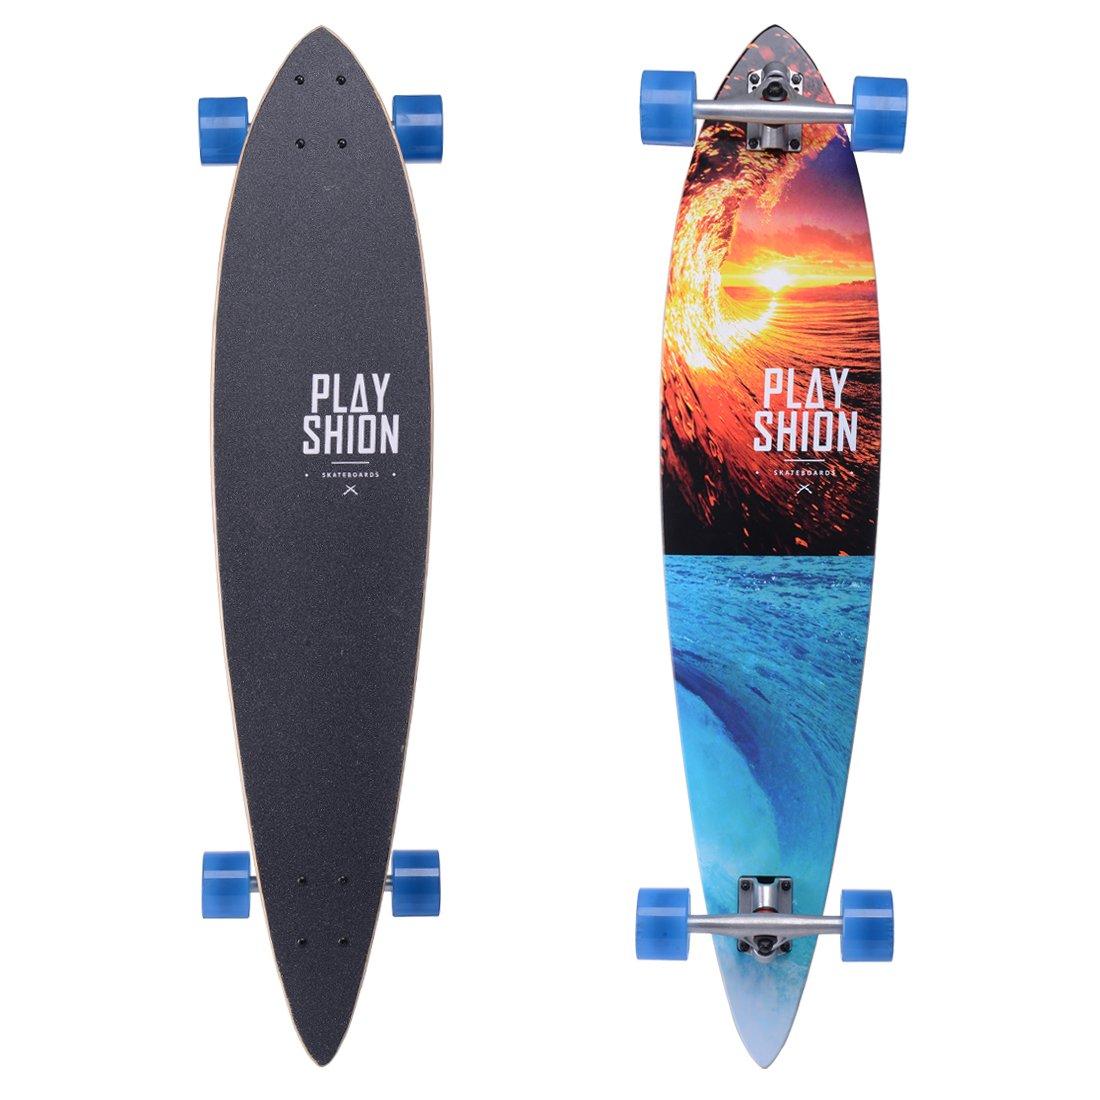 Playshion Cruising Longboard Skateboard Complete